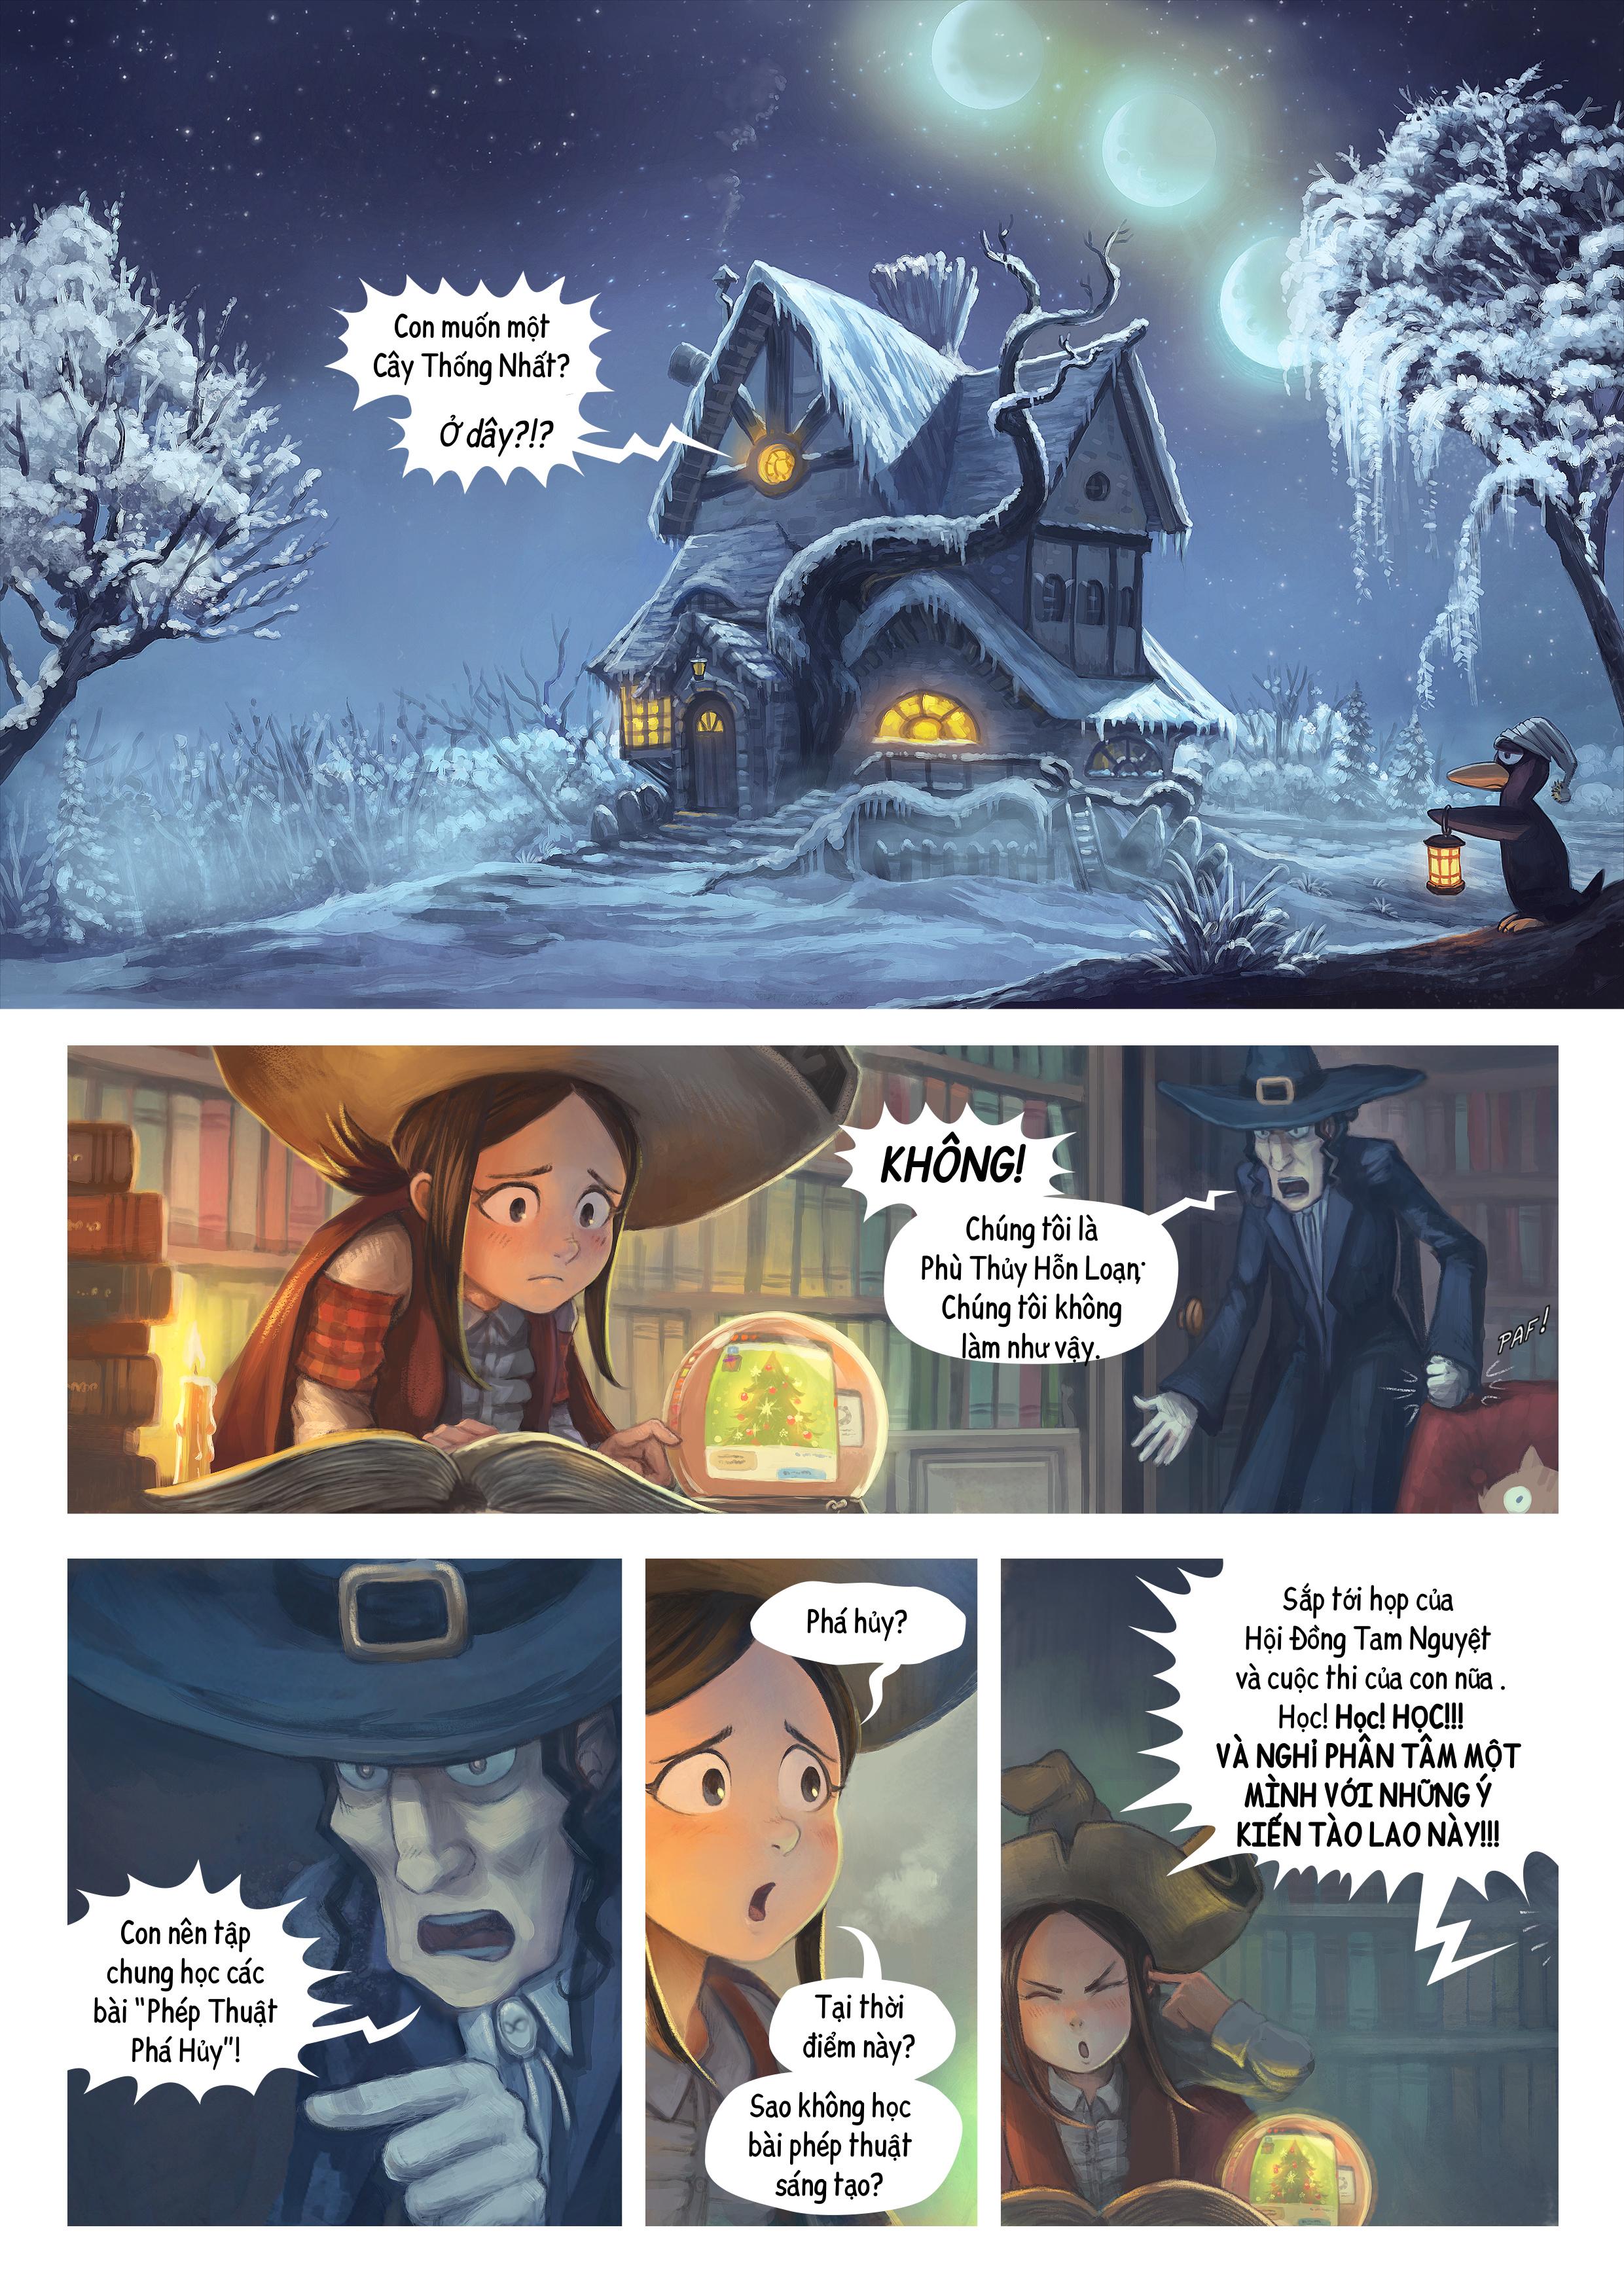 A webcomic page of Pepper&Carrot, Tập 24 [vi], trang 1